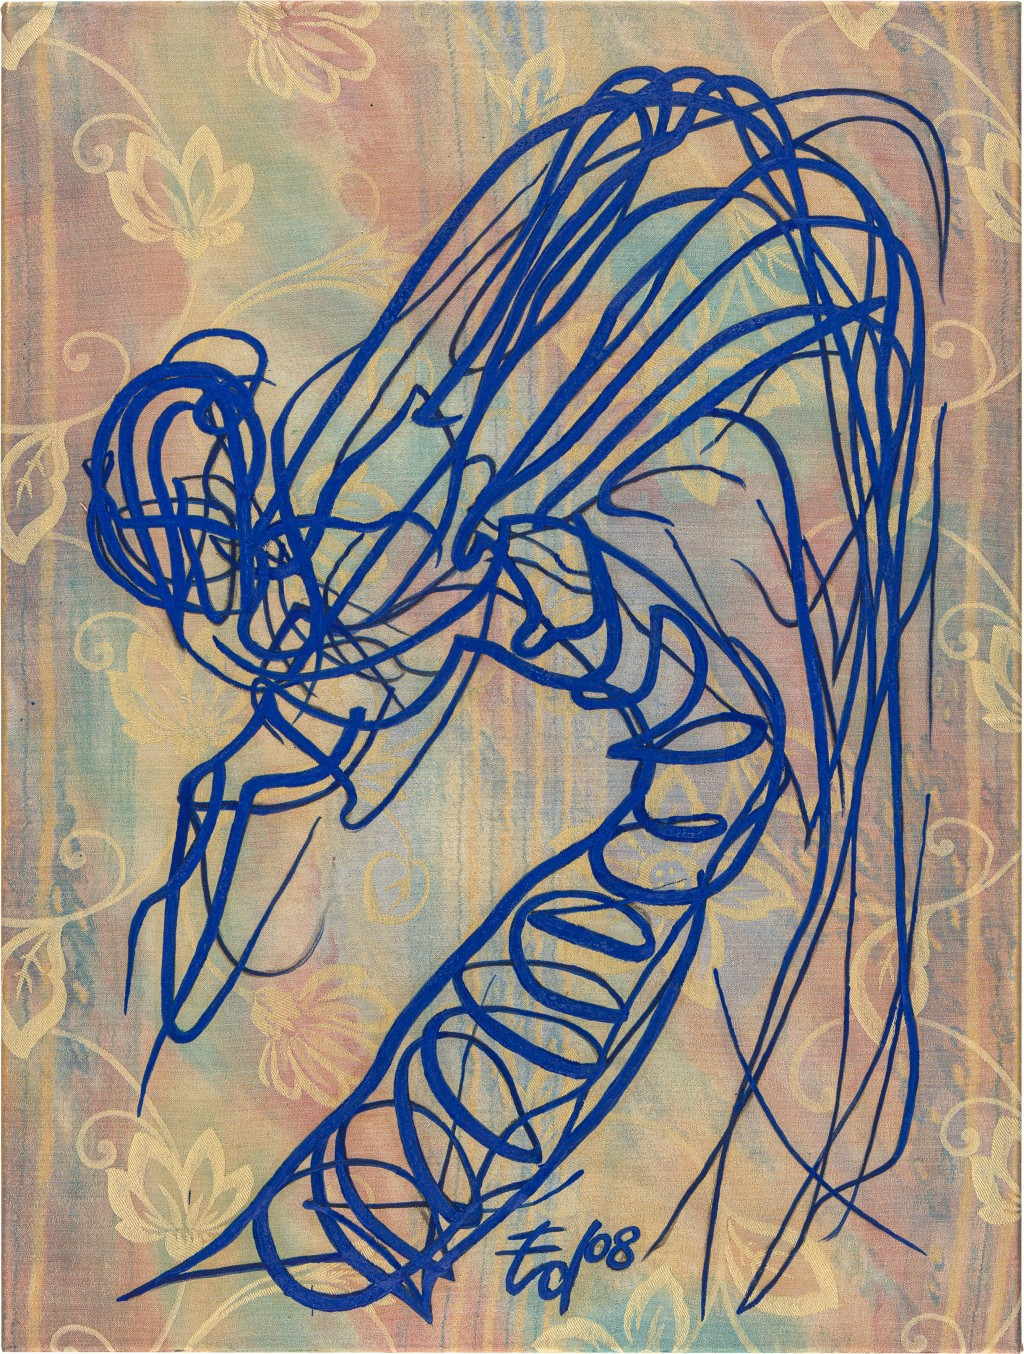 Libellenkörper gemalt in Blau